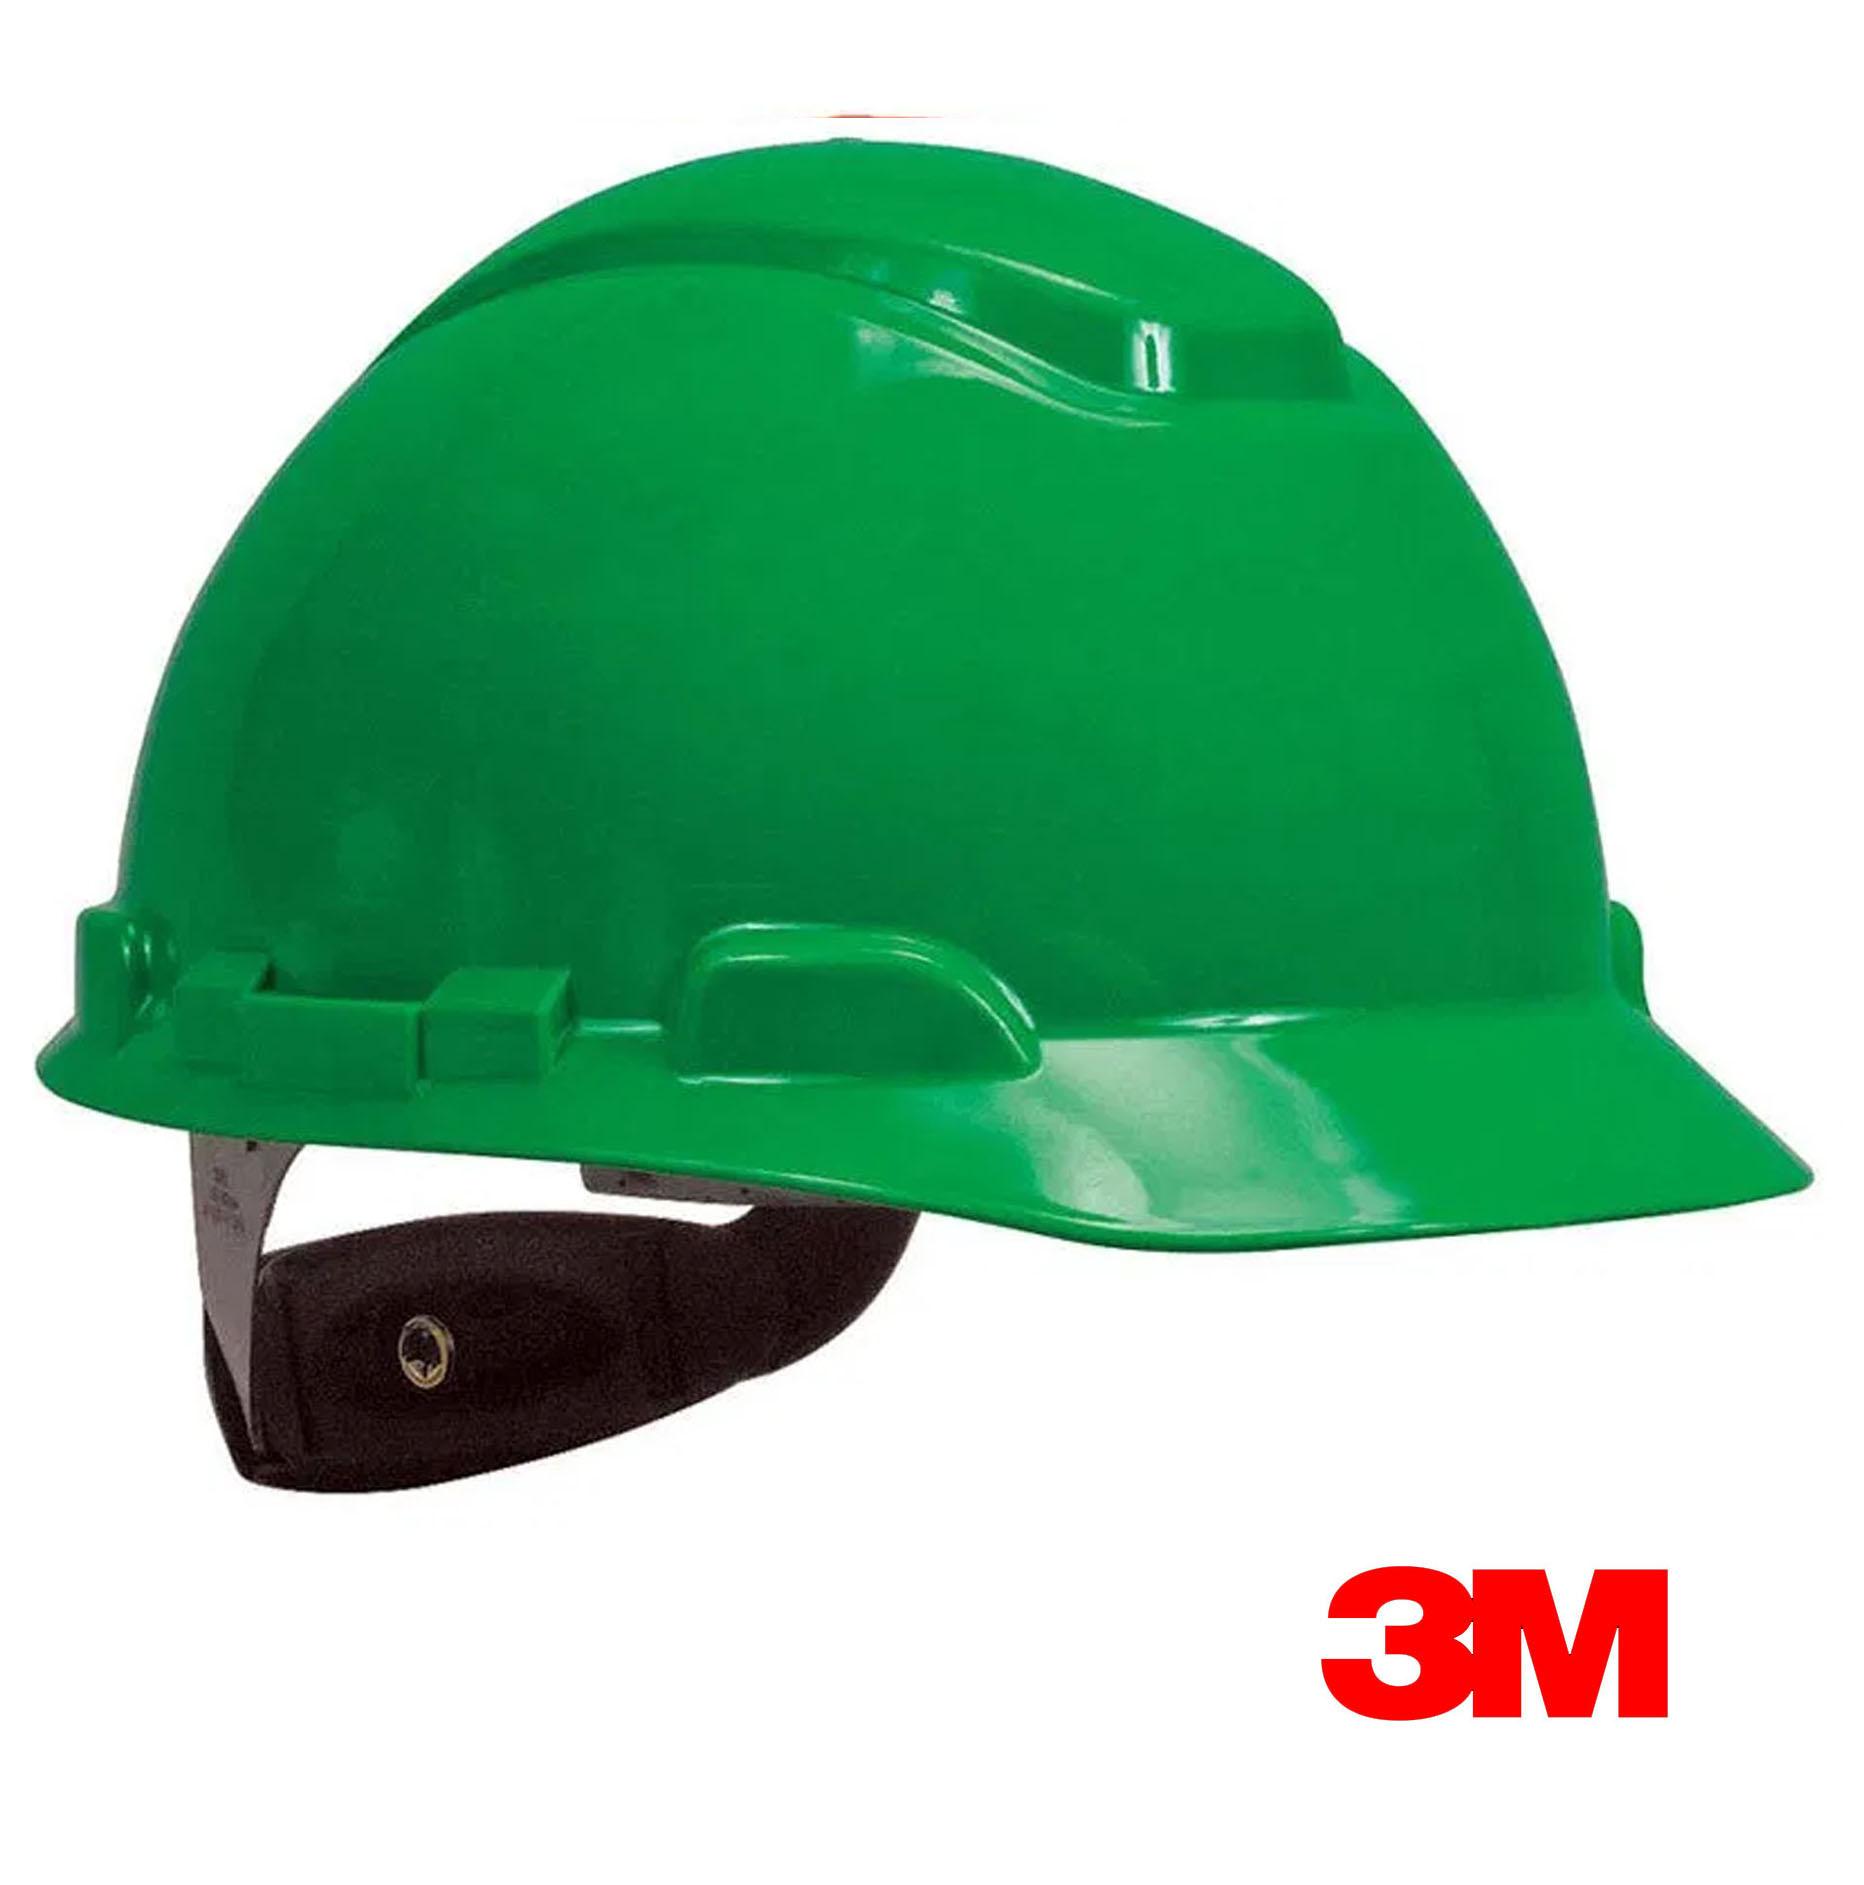 Casco de seguridad 3M Verde Con Rachet